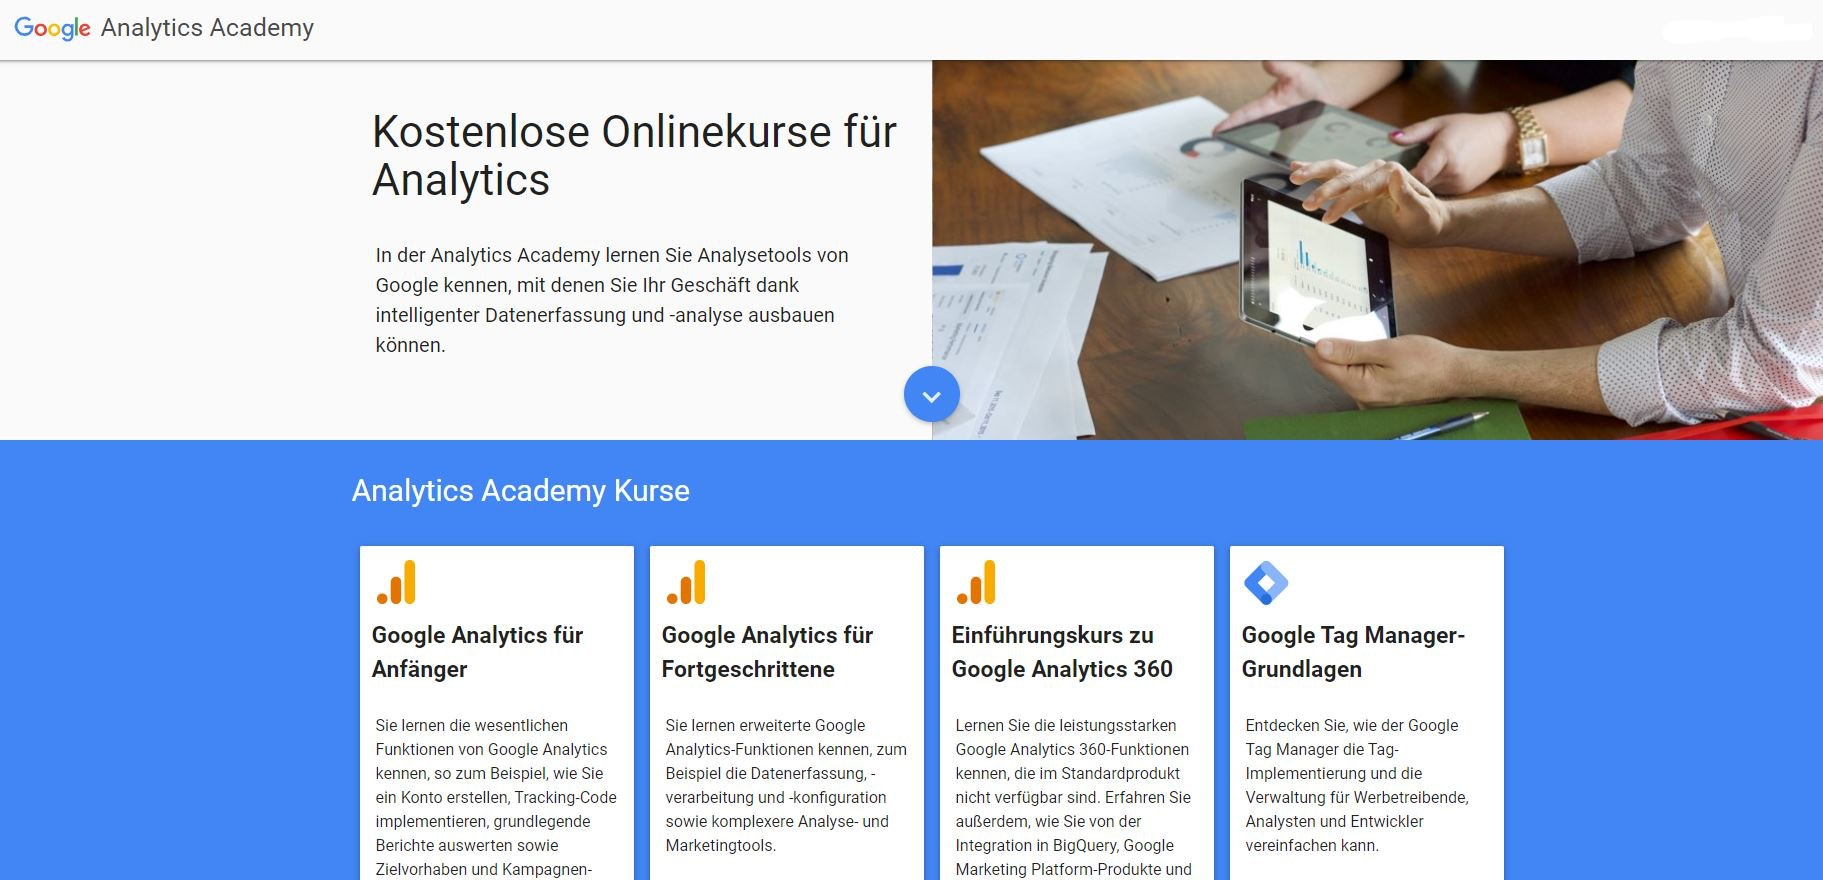 Google Analytics Academy Online Kurse